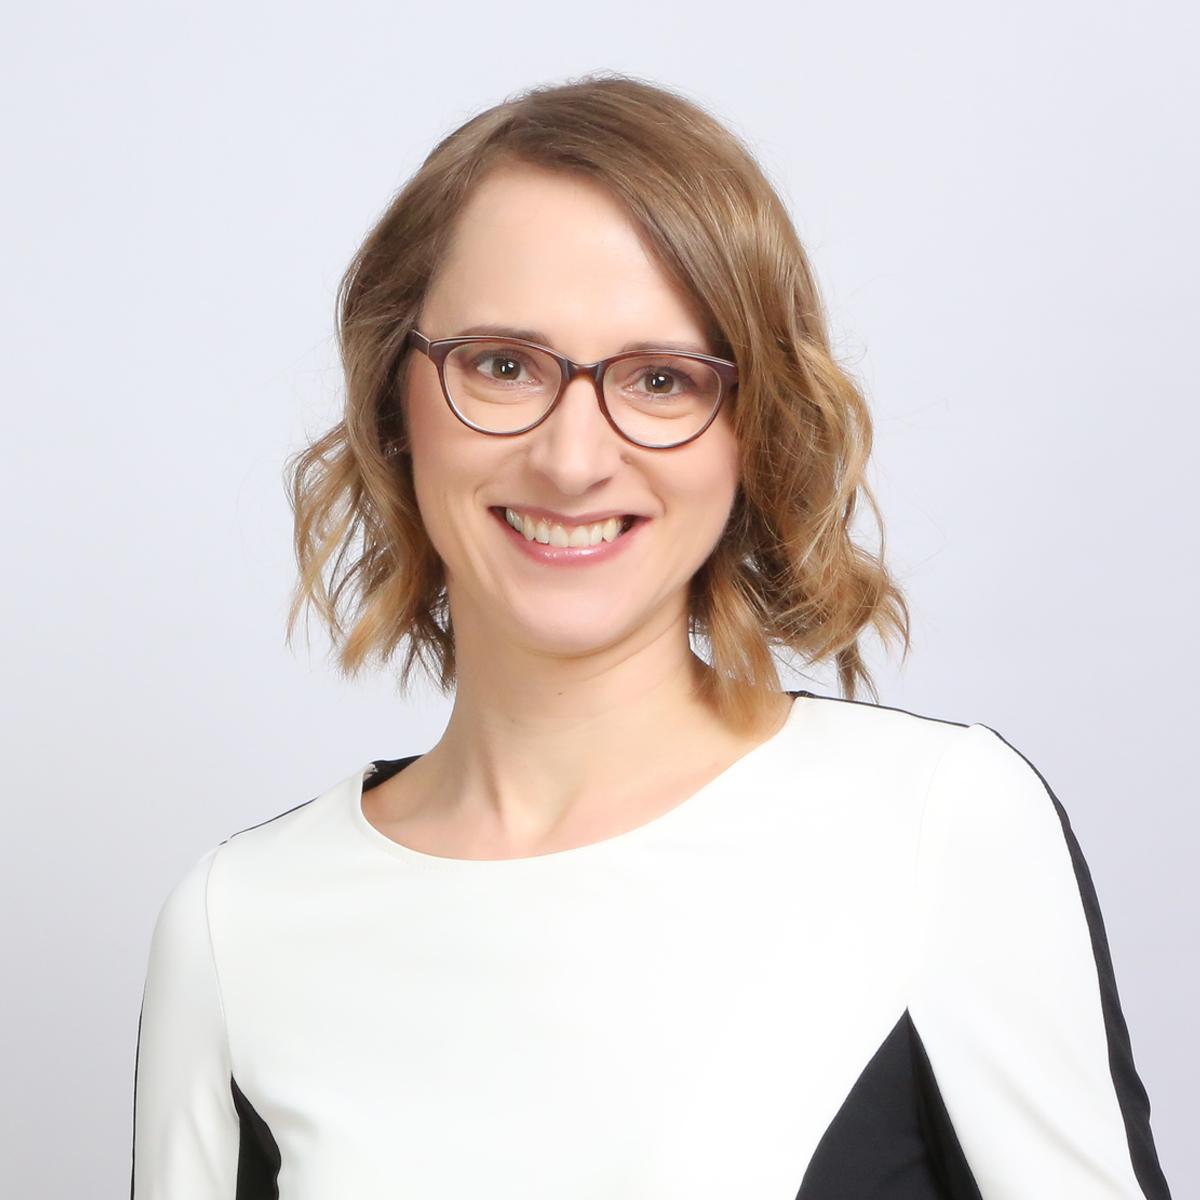 Monika Ott